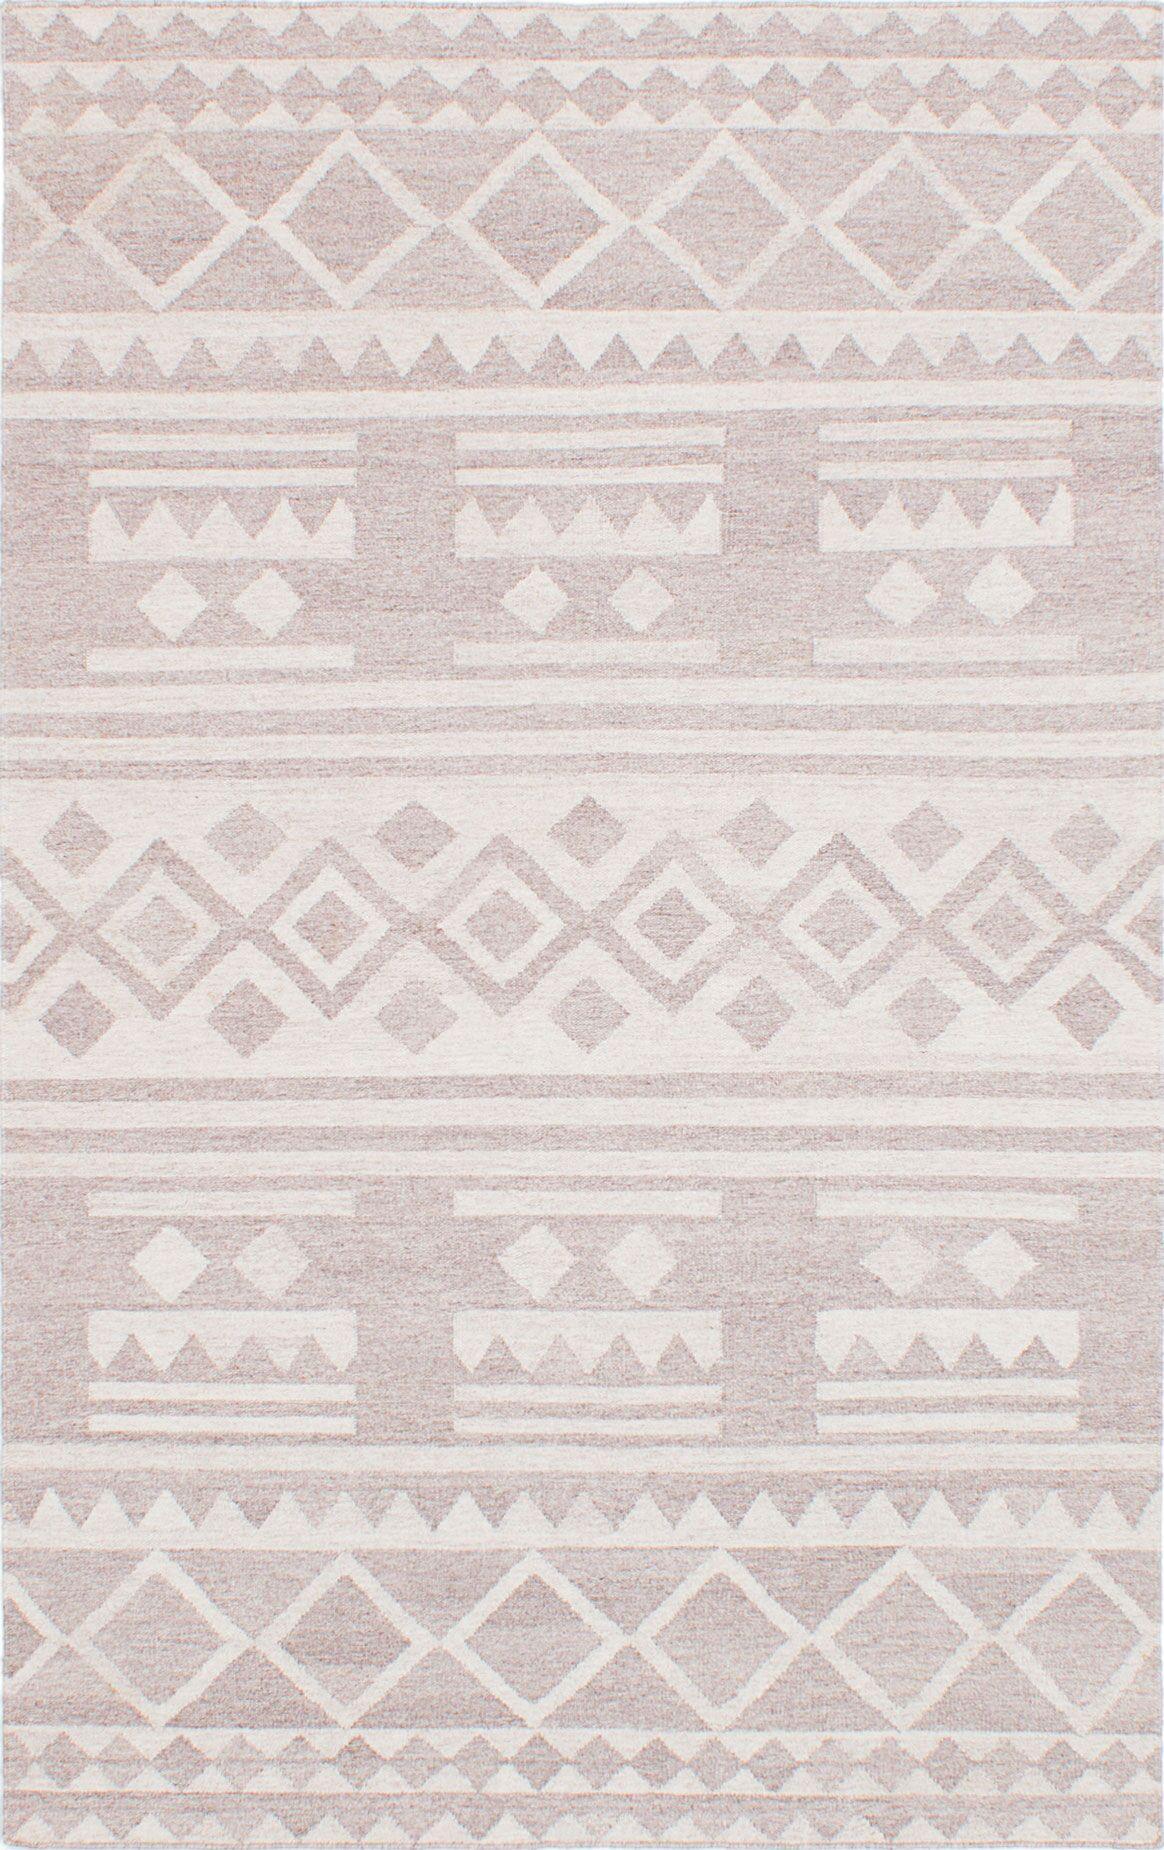 Tribeca Hand-Woven Beige Area Rug Rug Size: 8' x 10'